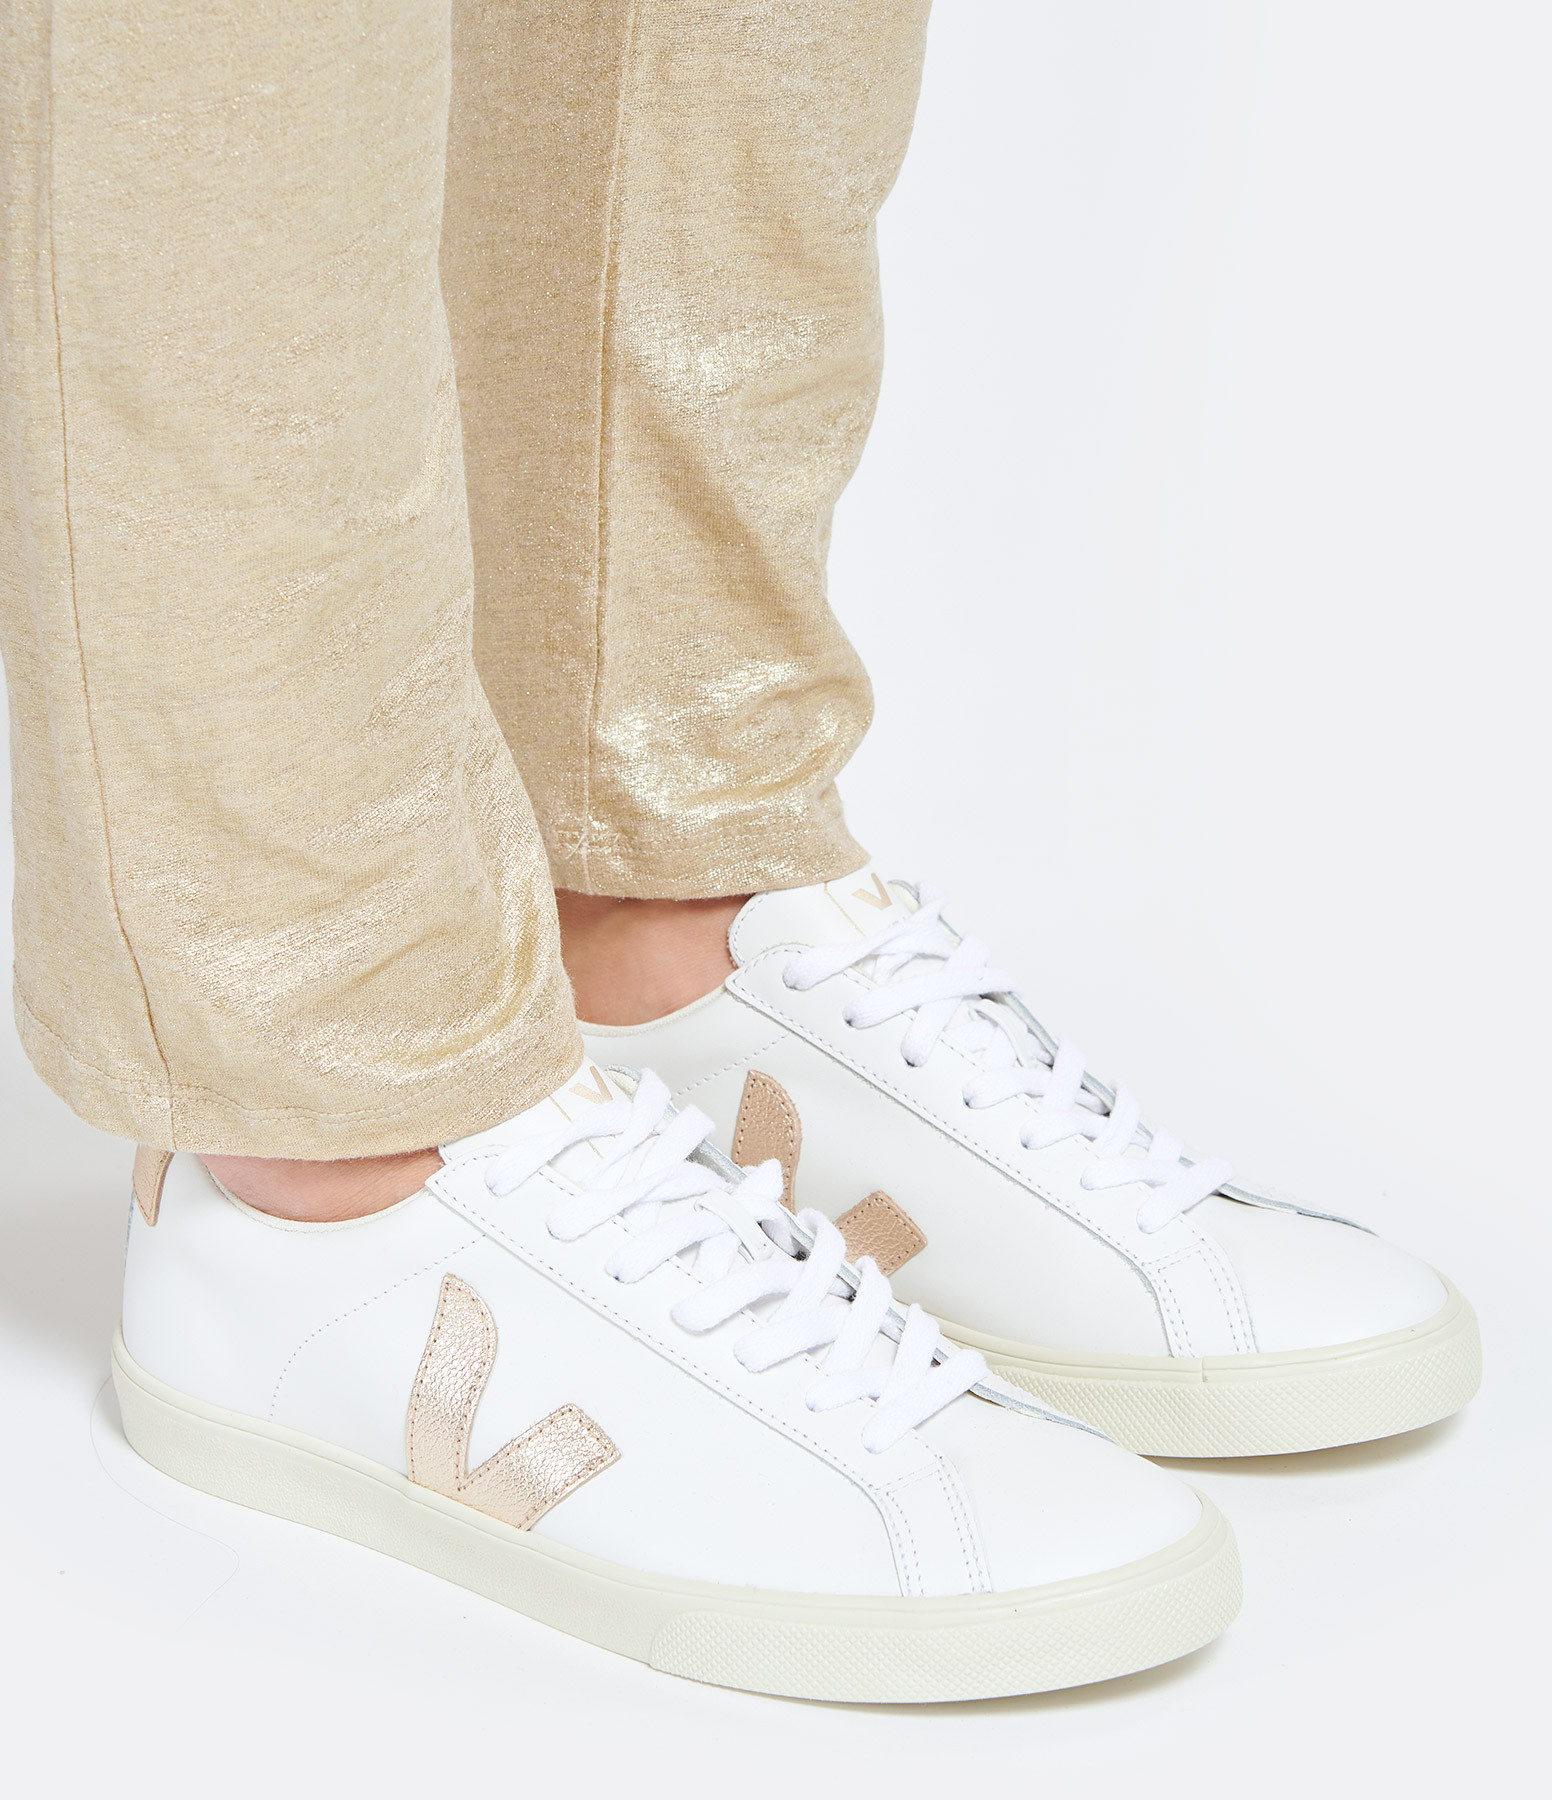 VEJA - Baskets Esplar Cuir Extra White Platine